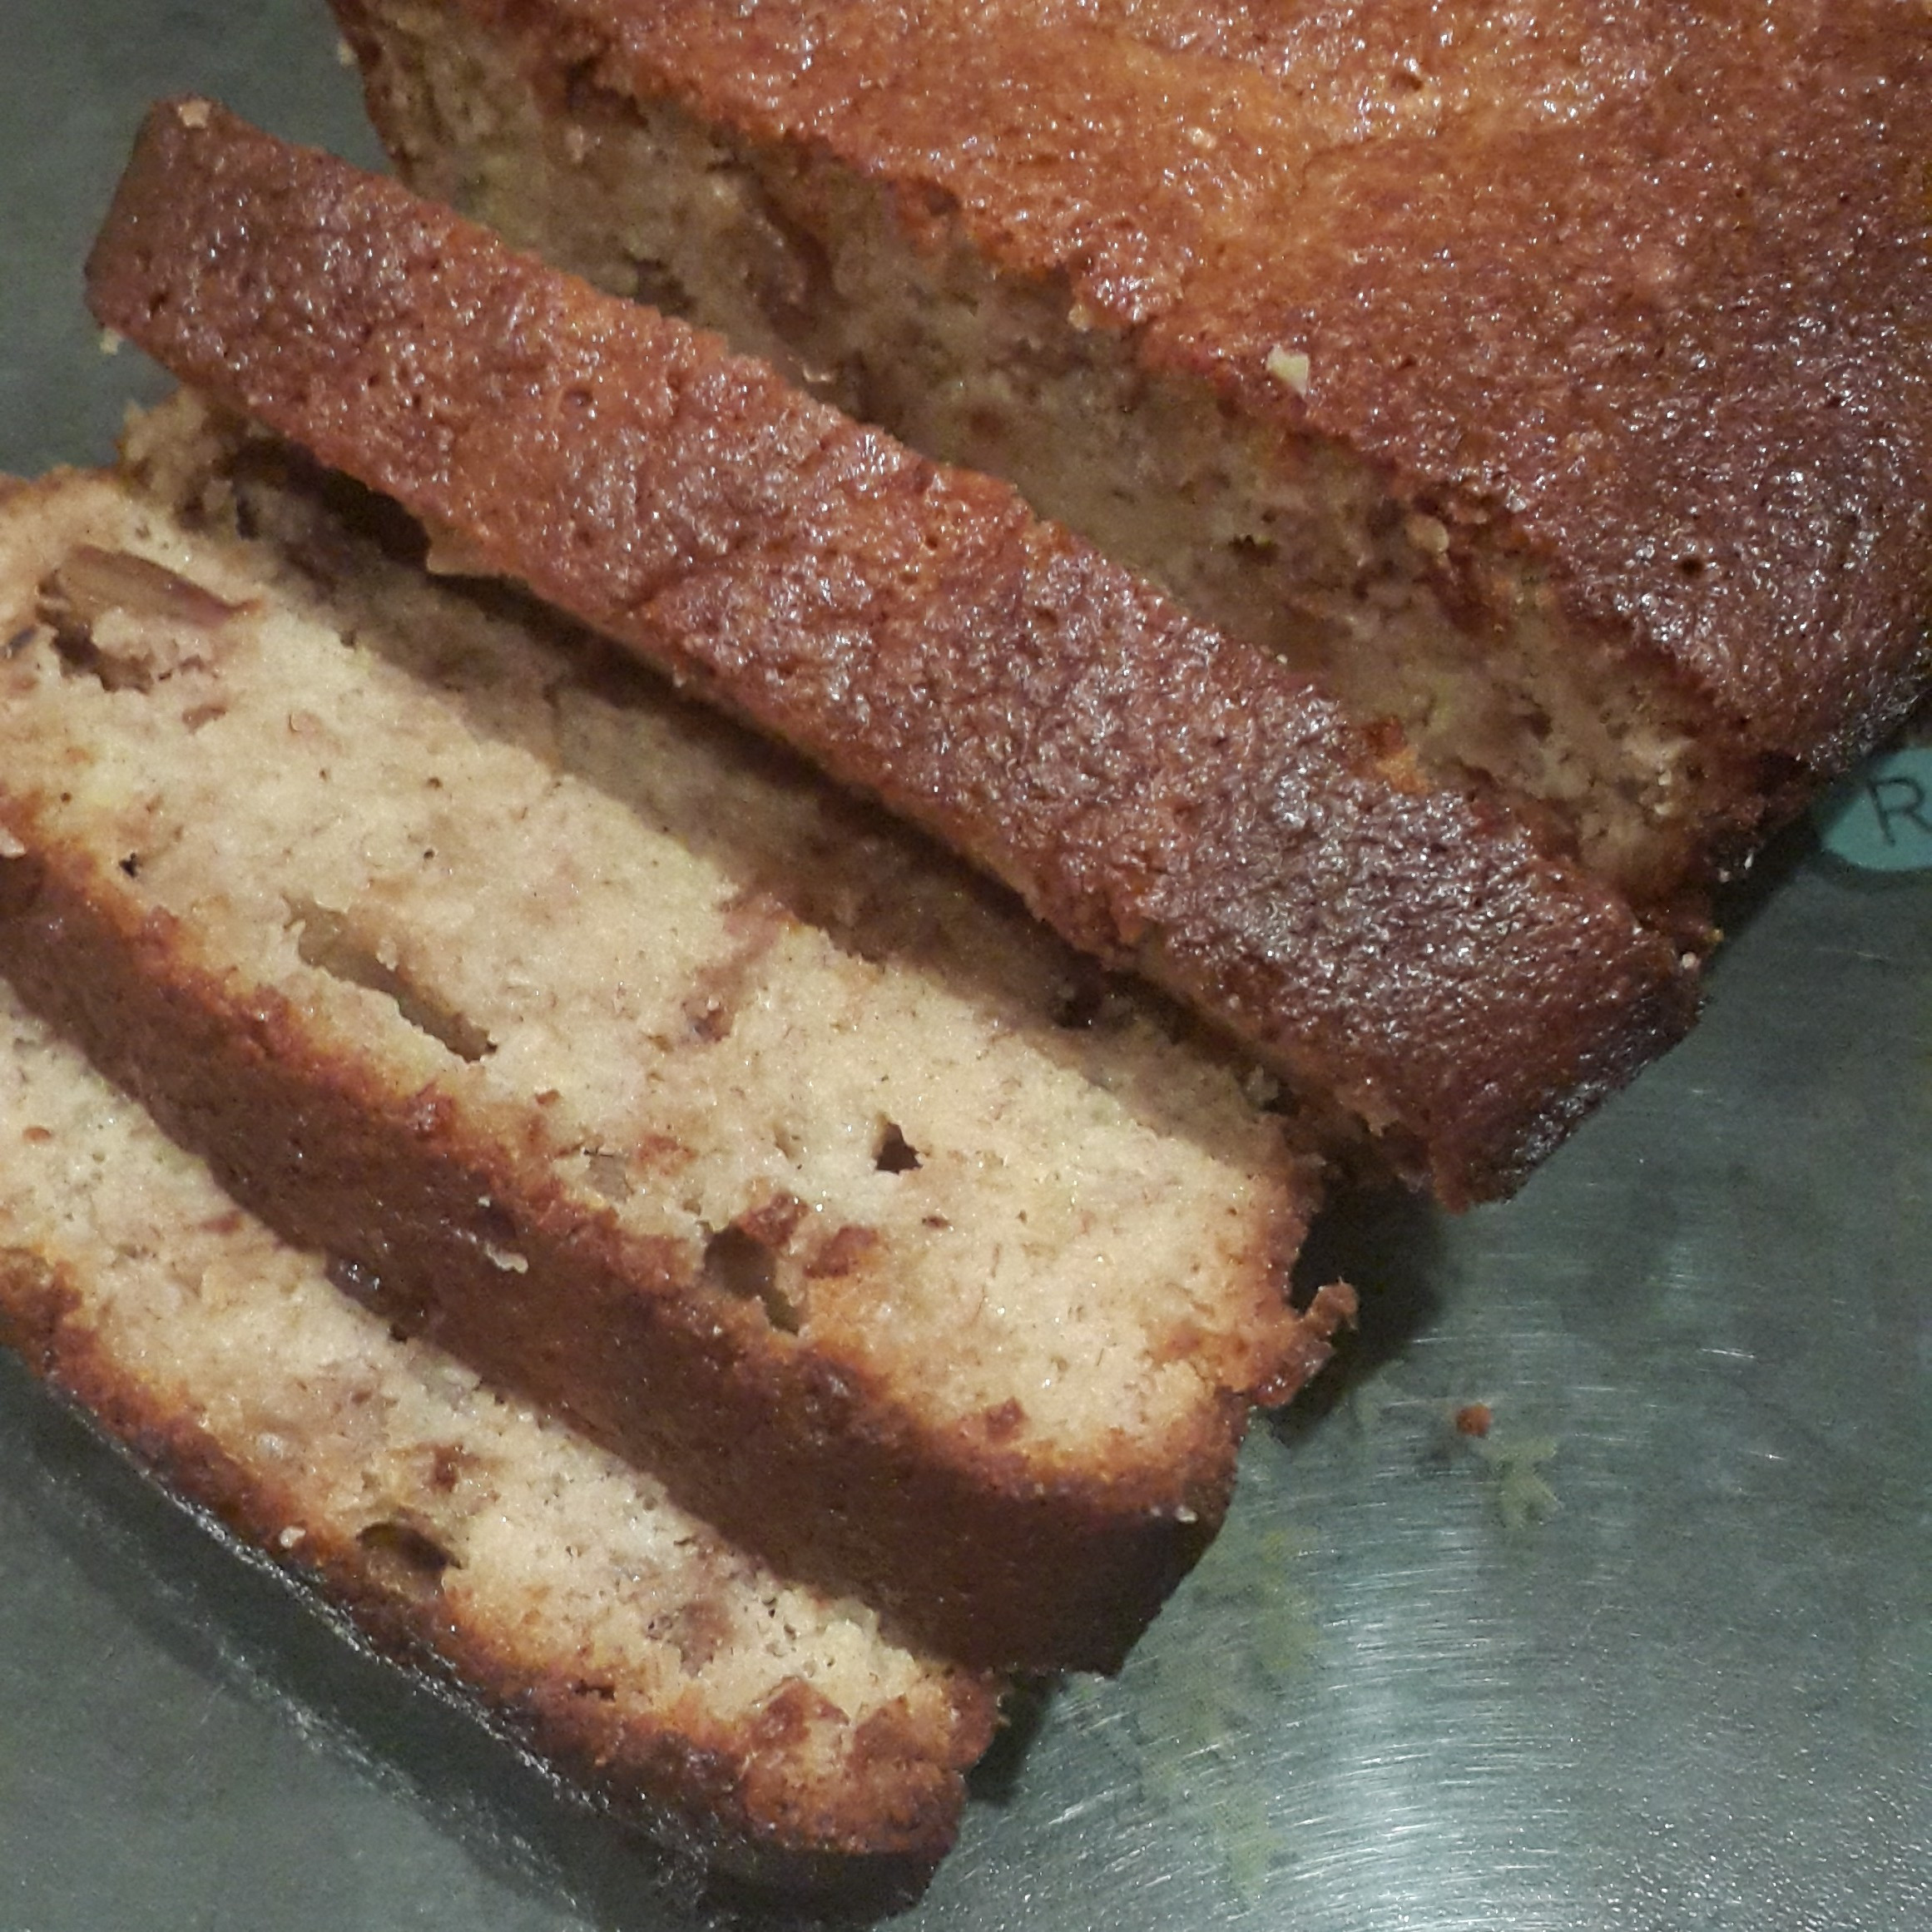 Gluten Free Banana Bread With Almond Flour  Almond Flour Banana Bread Gluten and Dairy Free 3 Kids